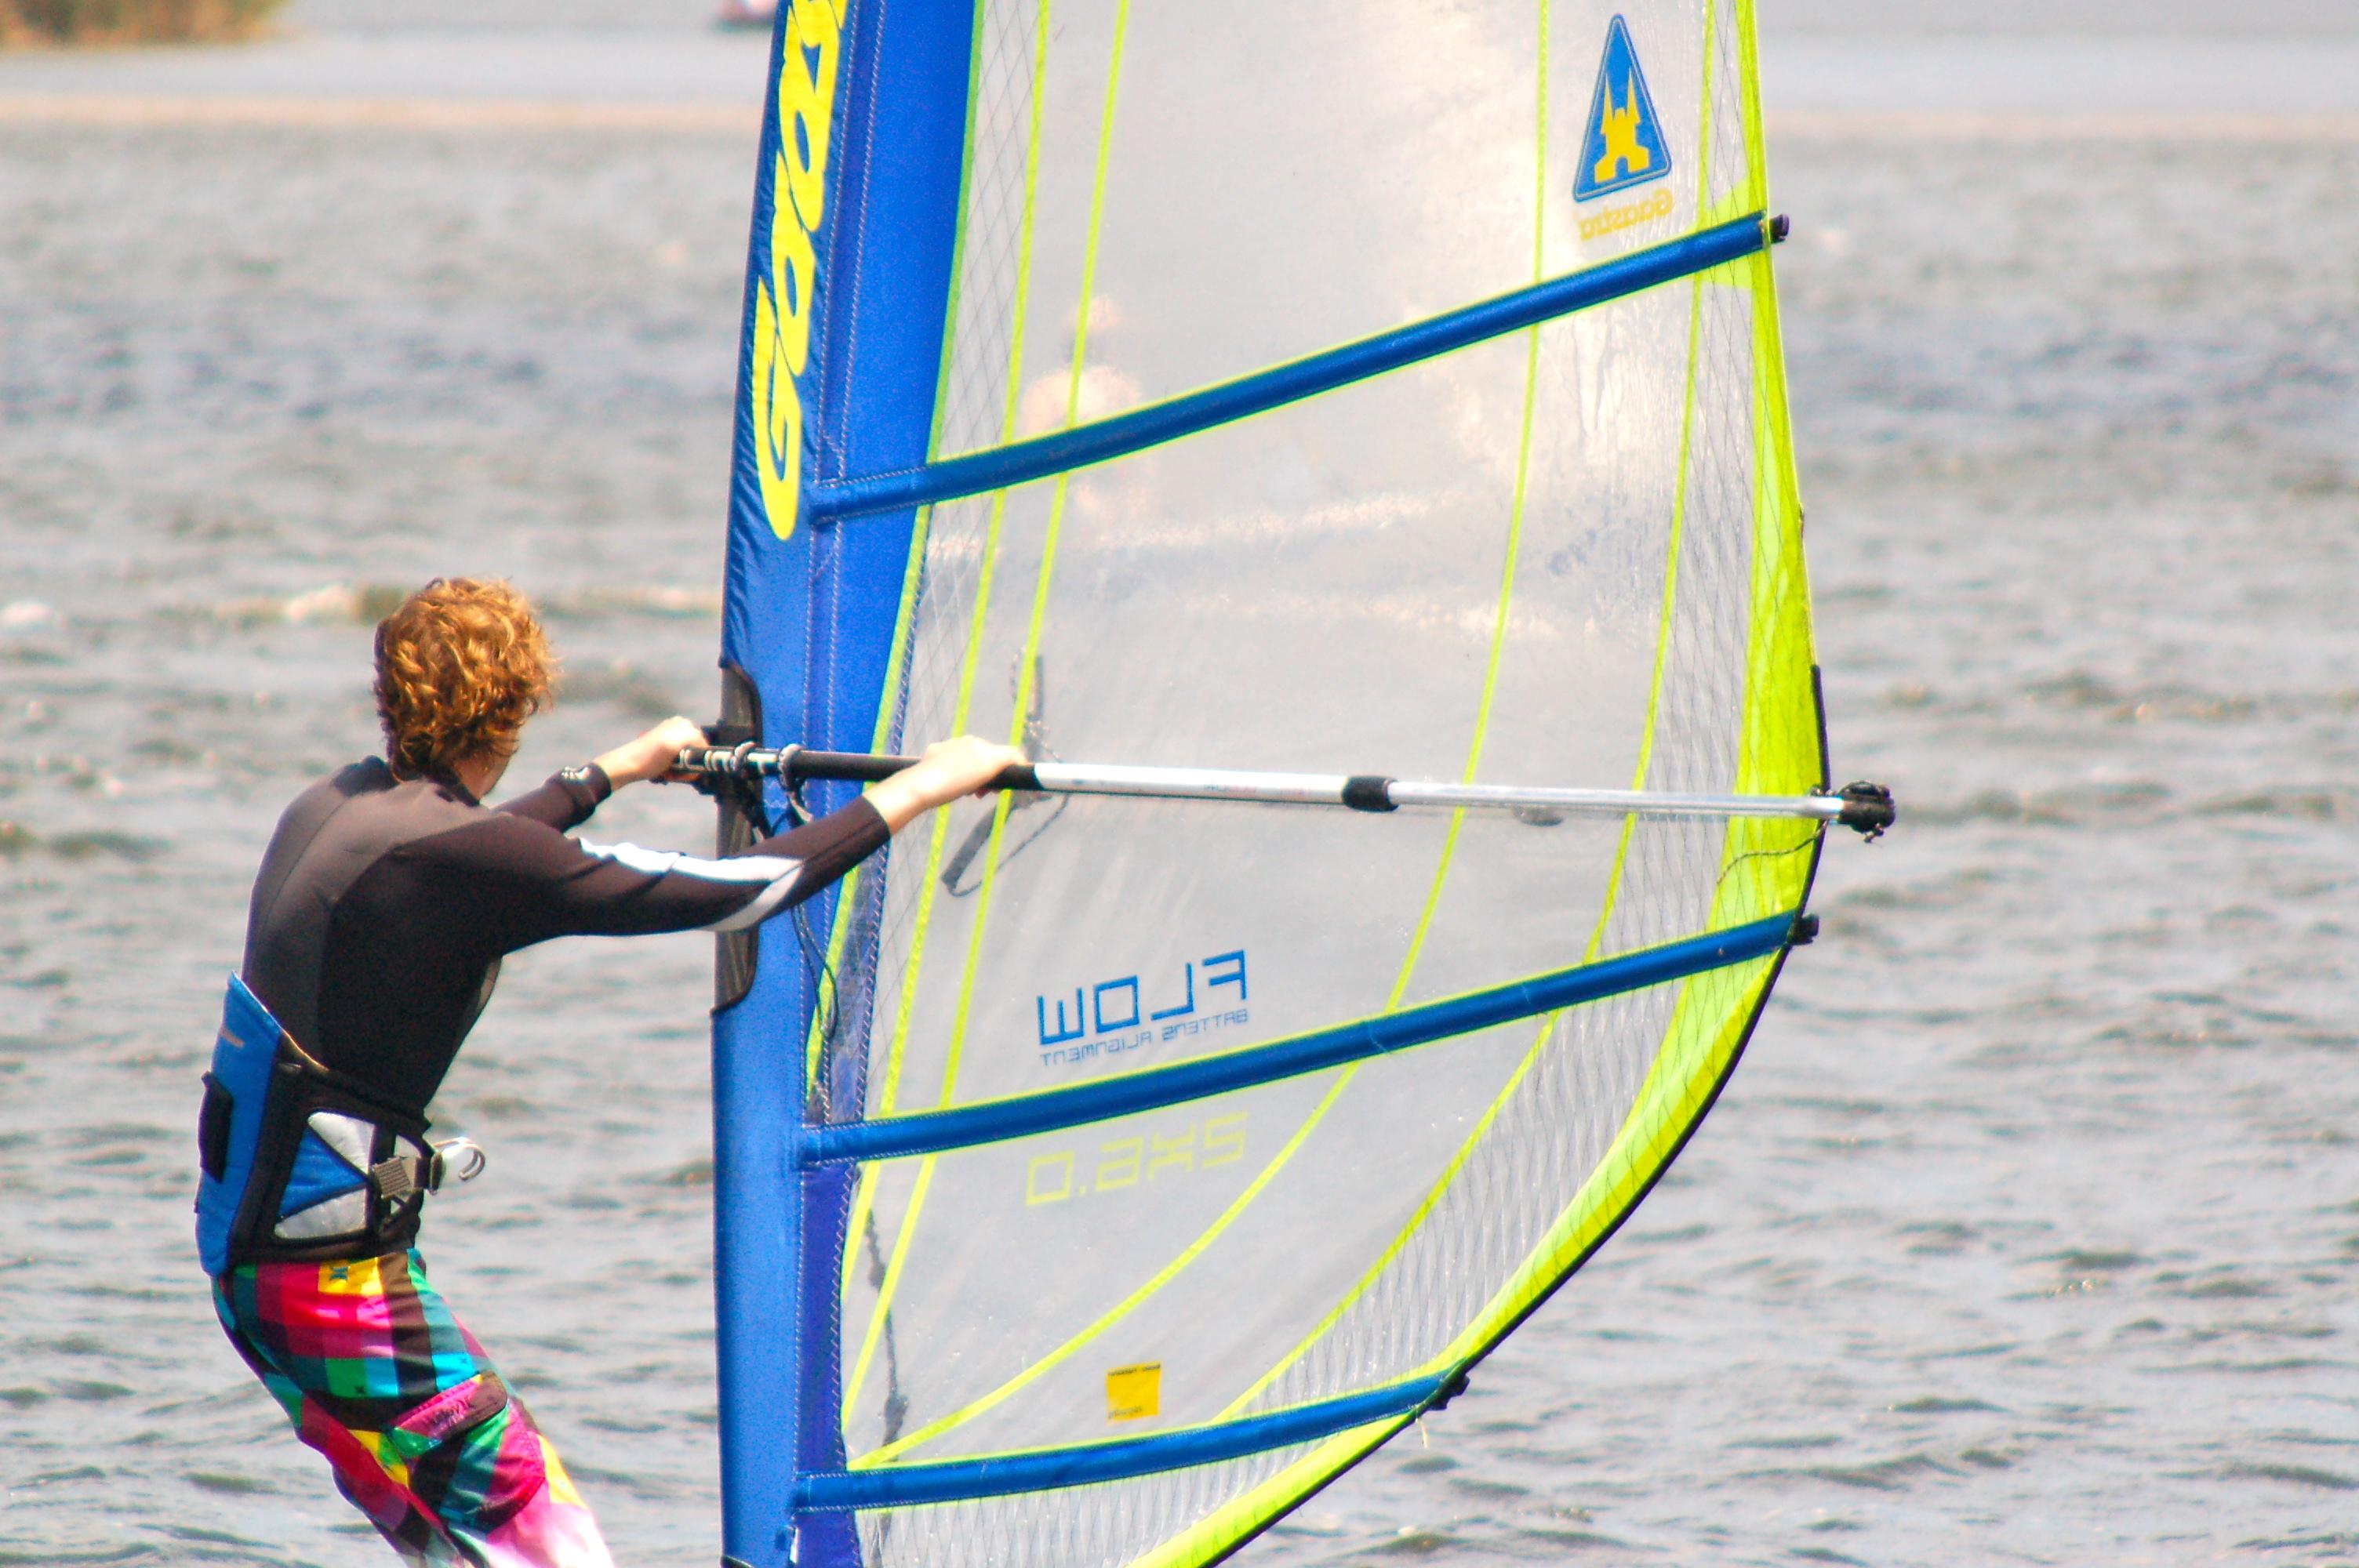 Windsurfing, Narrabeen Lake, Sydney, Australia